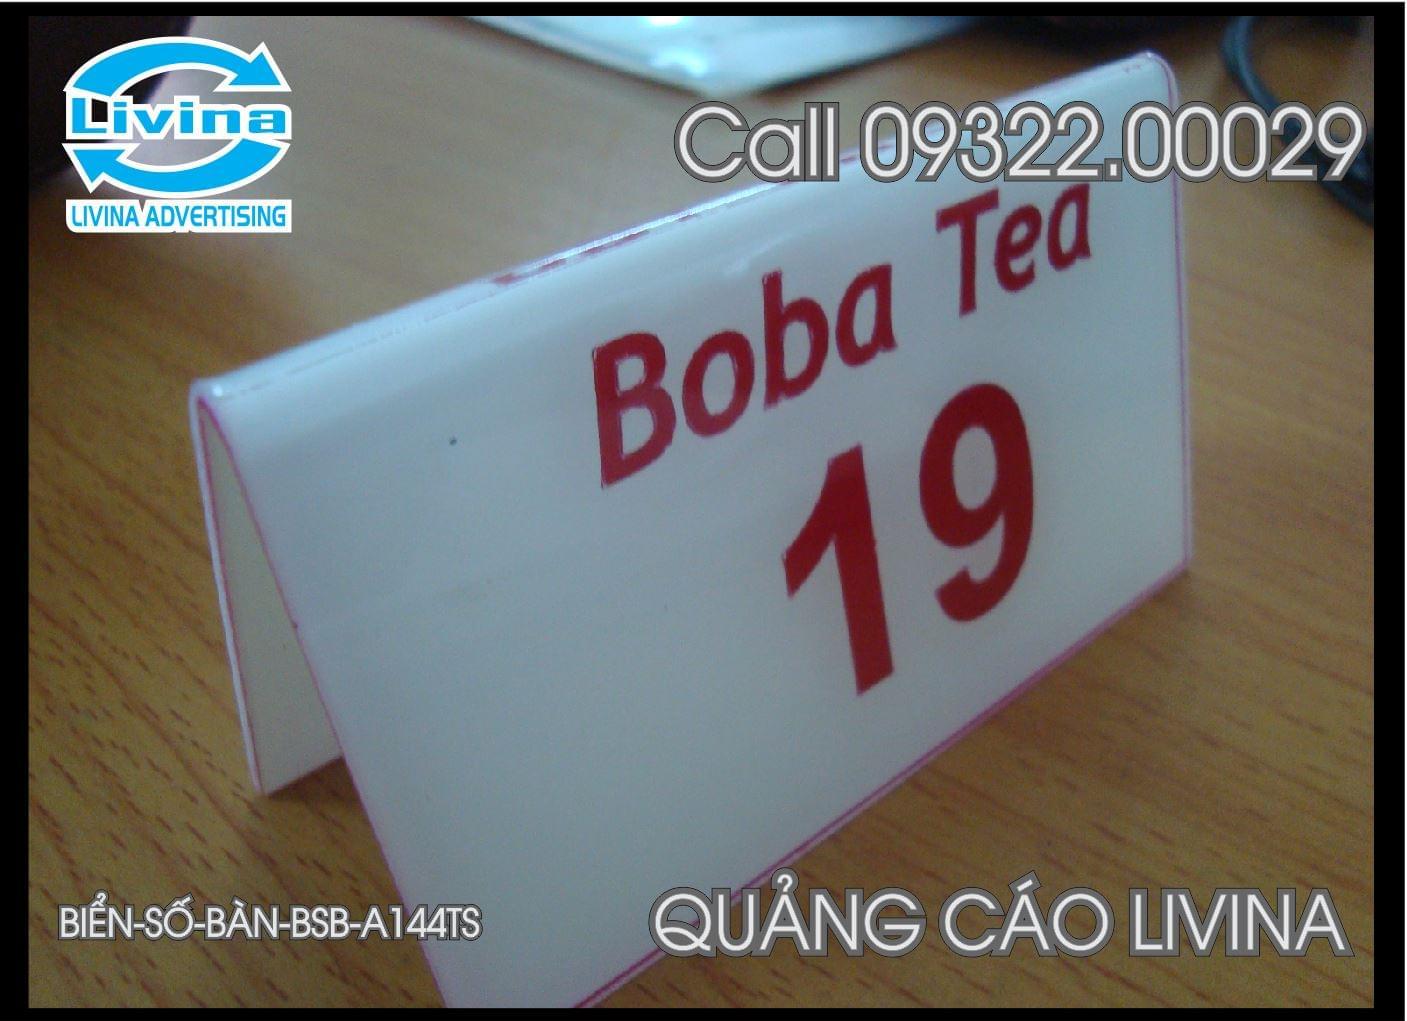 Biển Số bàn -BSB-AS144TS